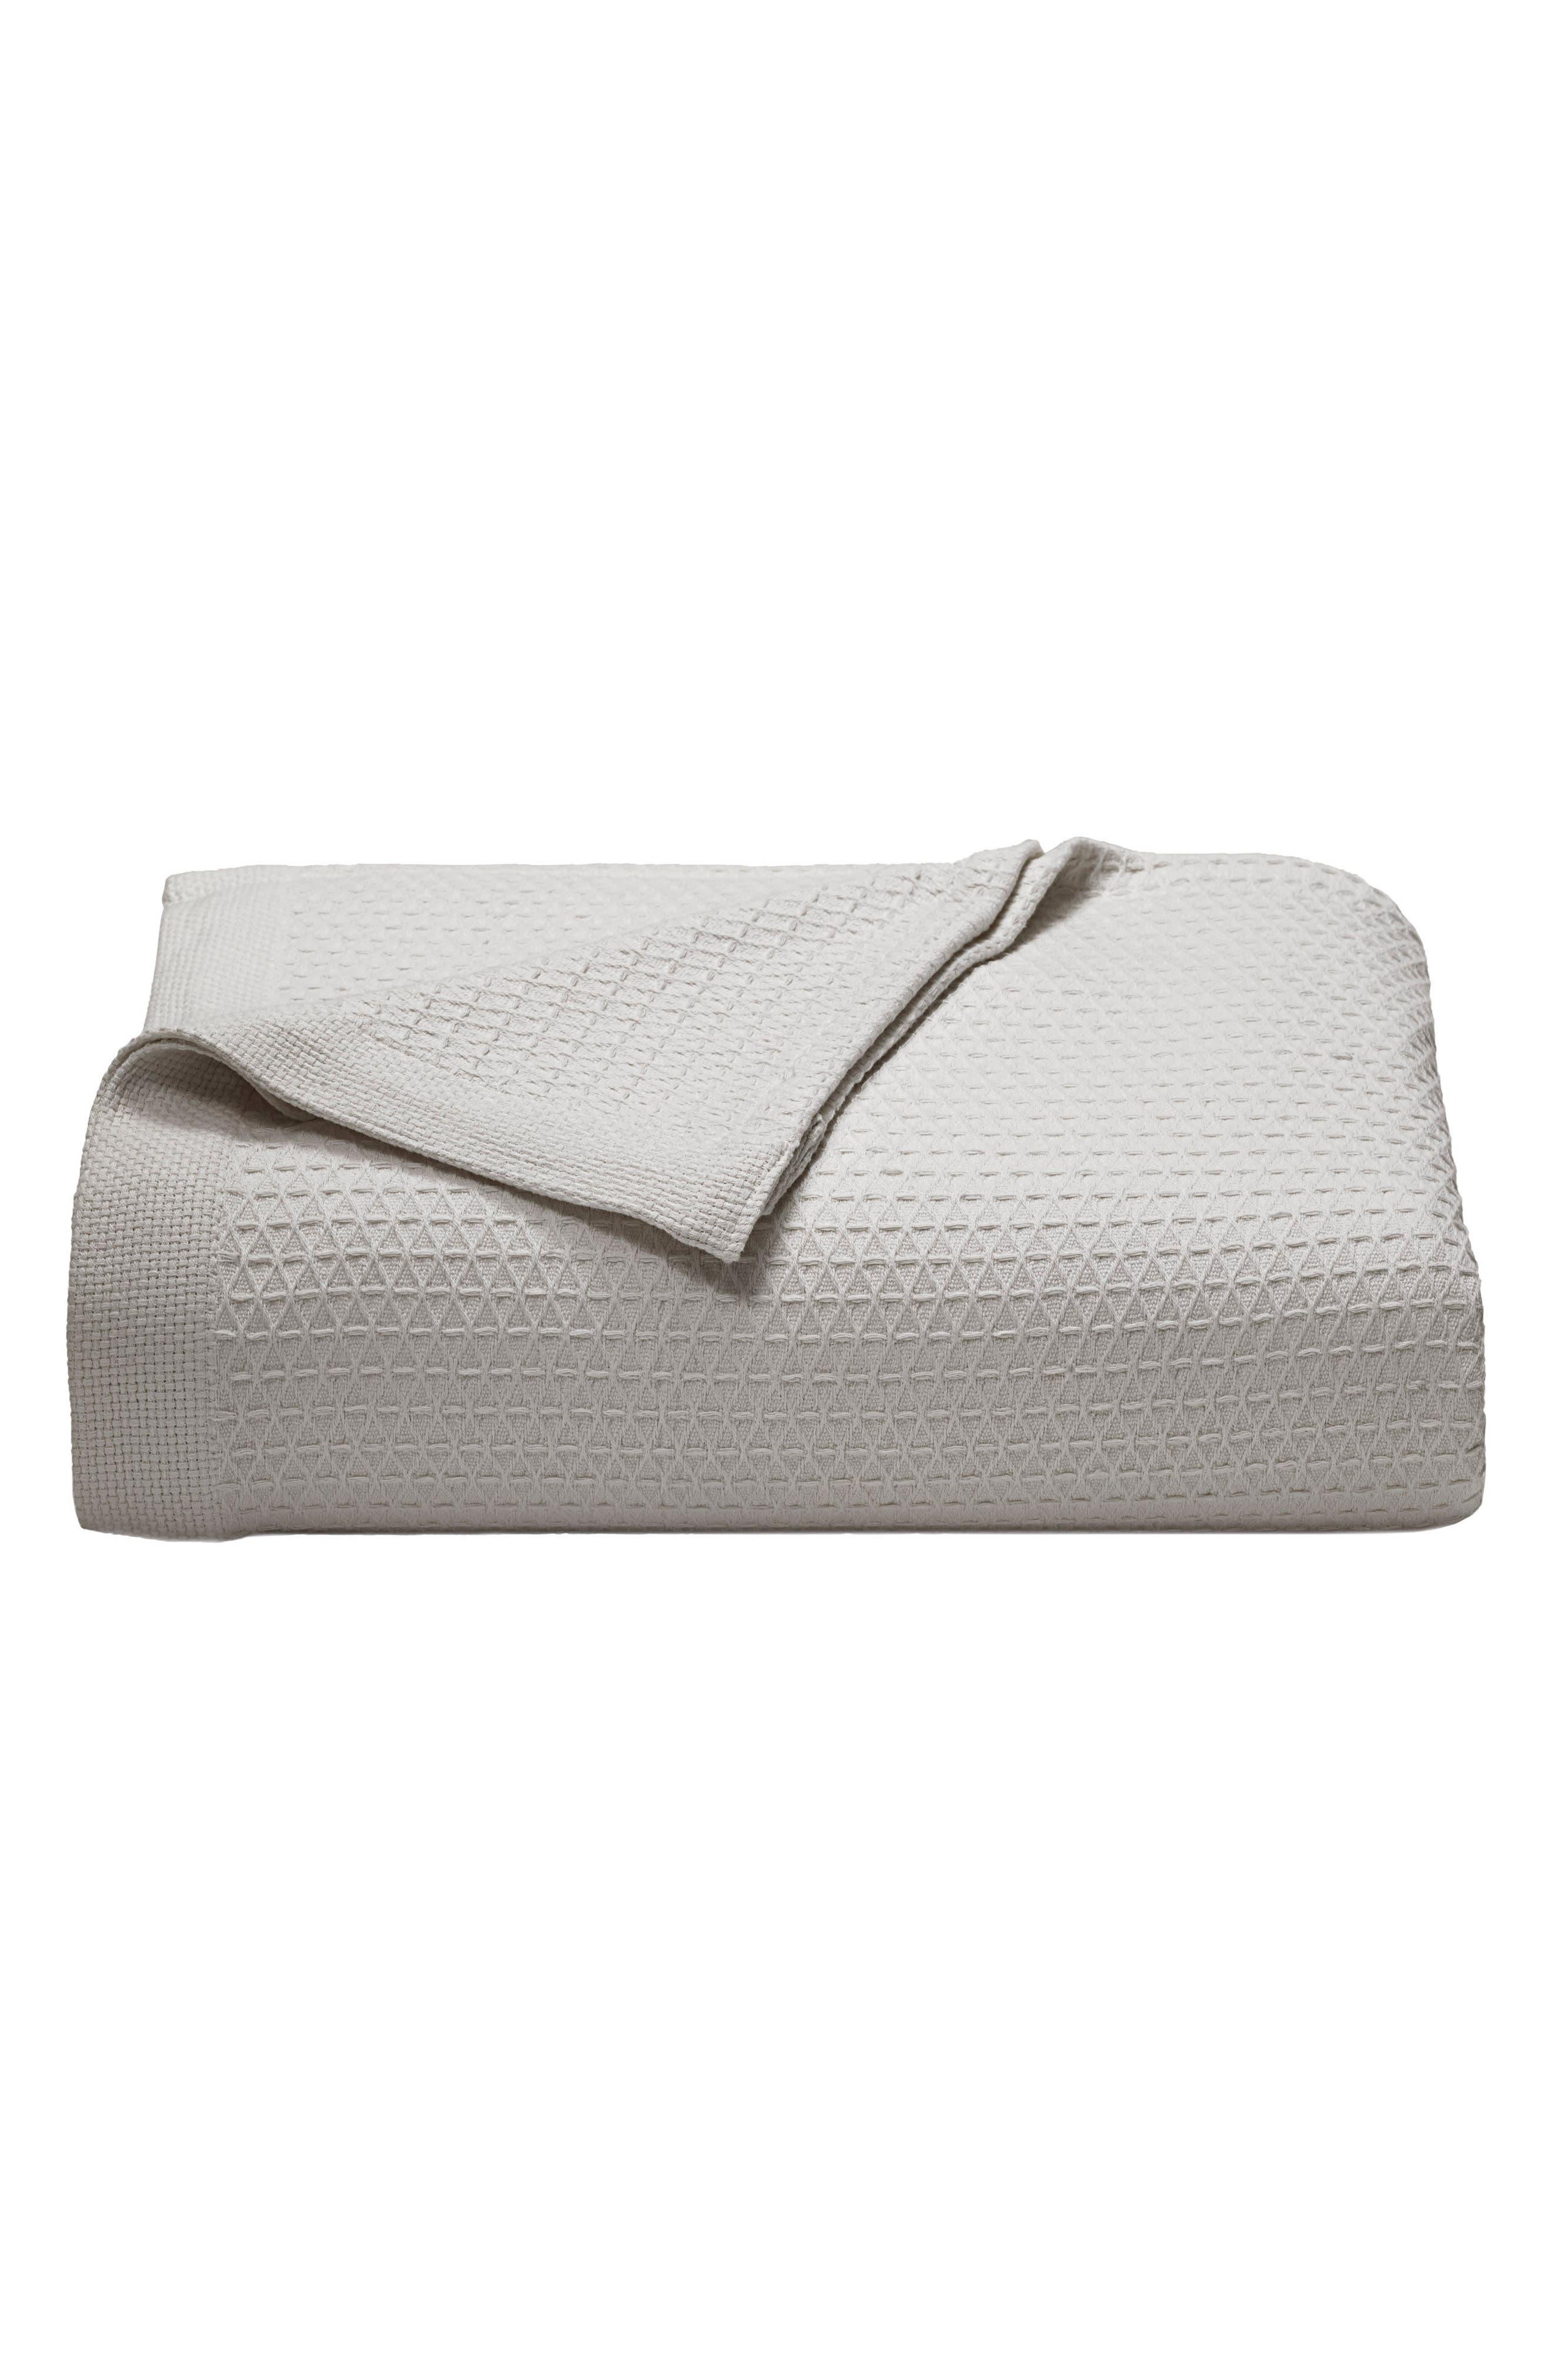 Baird Blanket,                         Main,                         color, PASTEL GREY